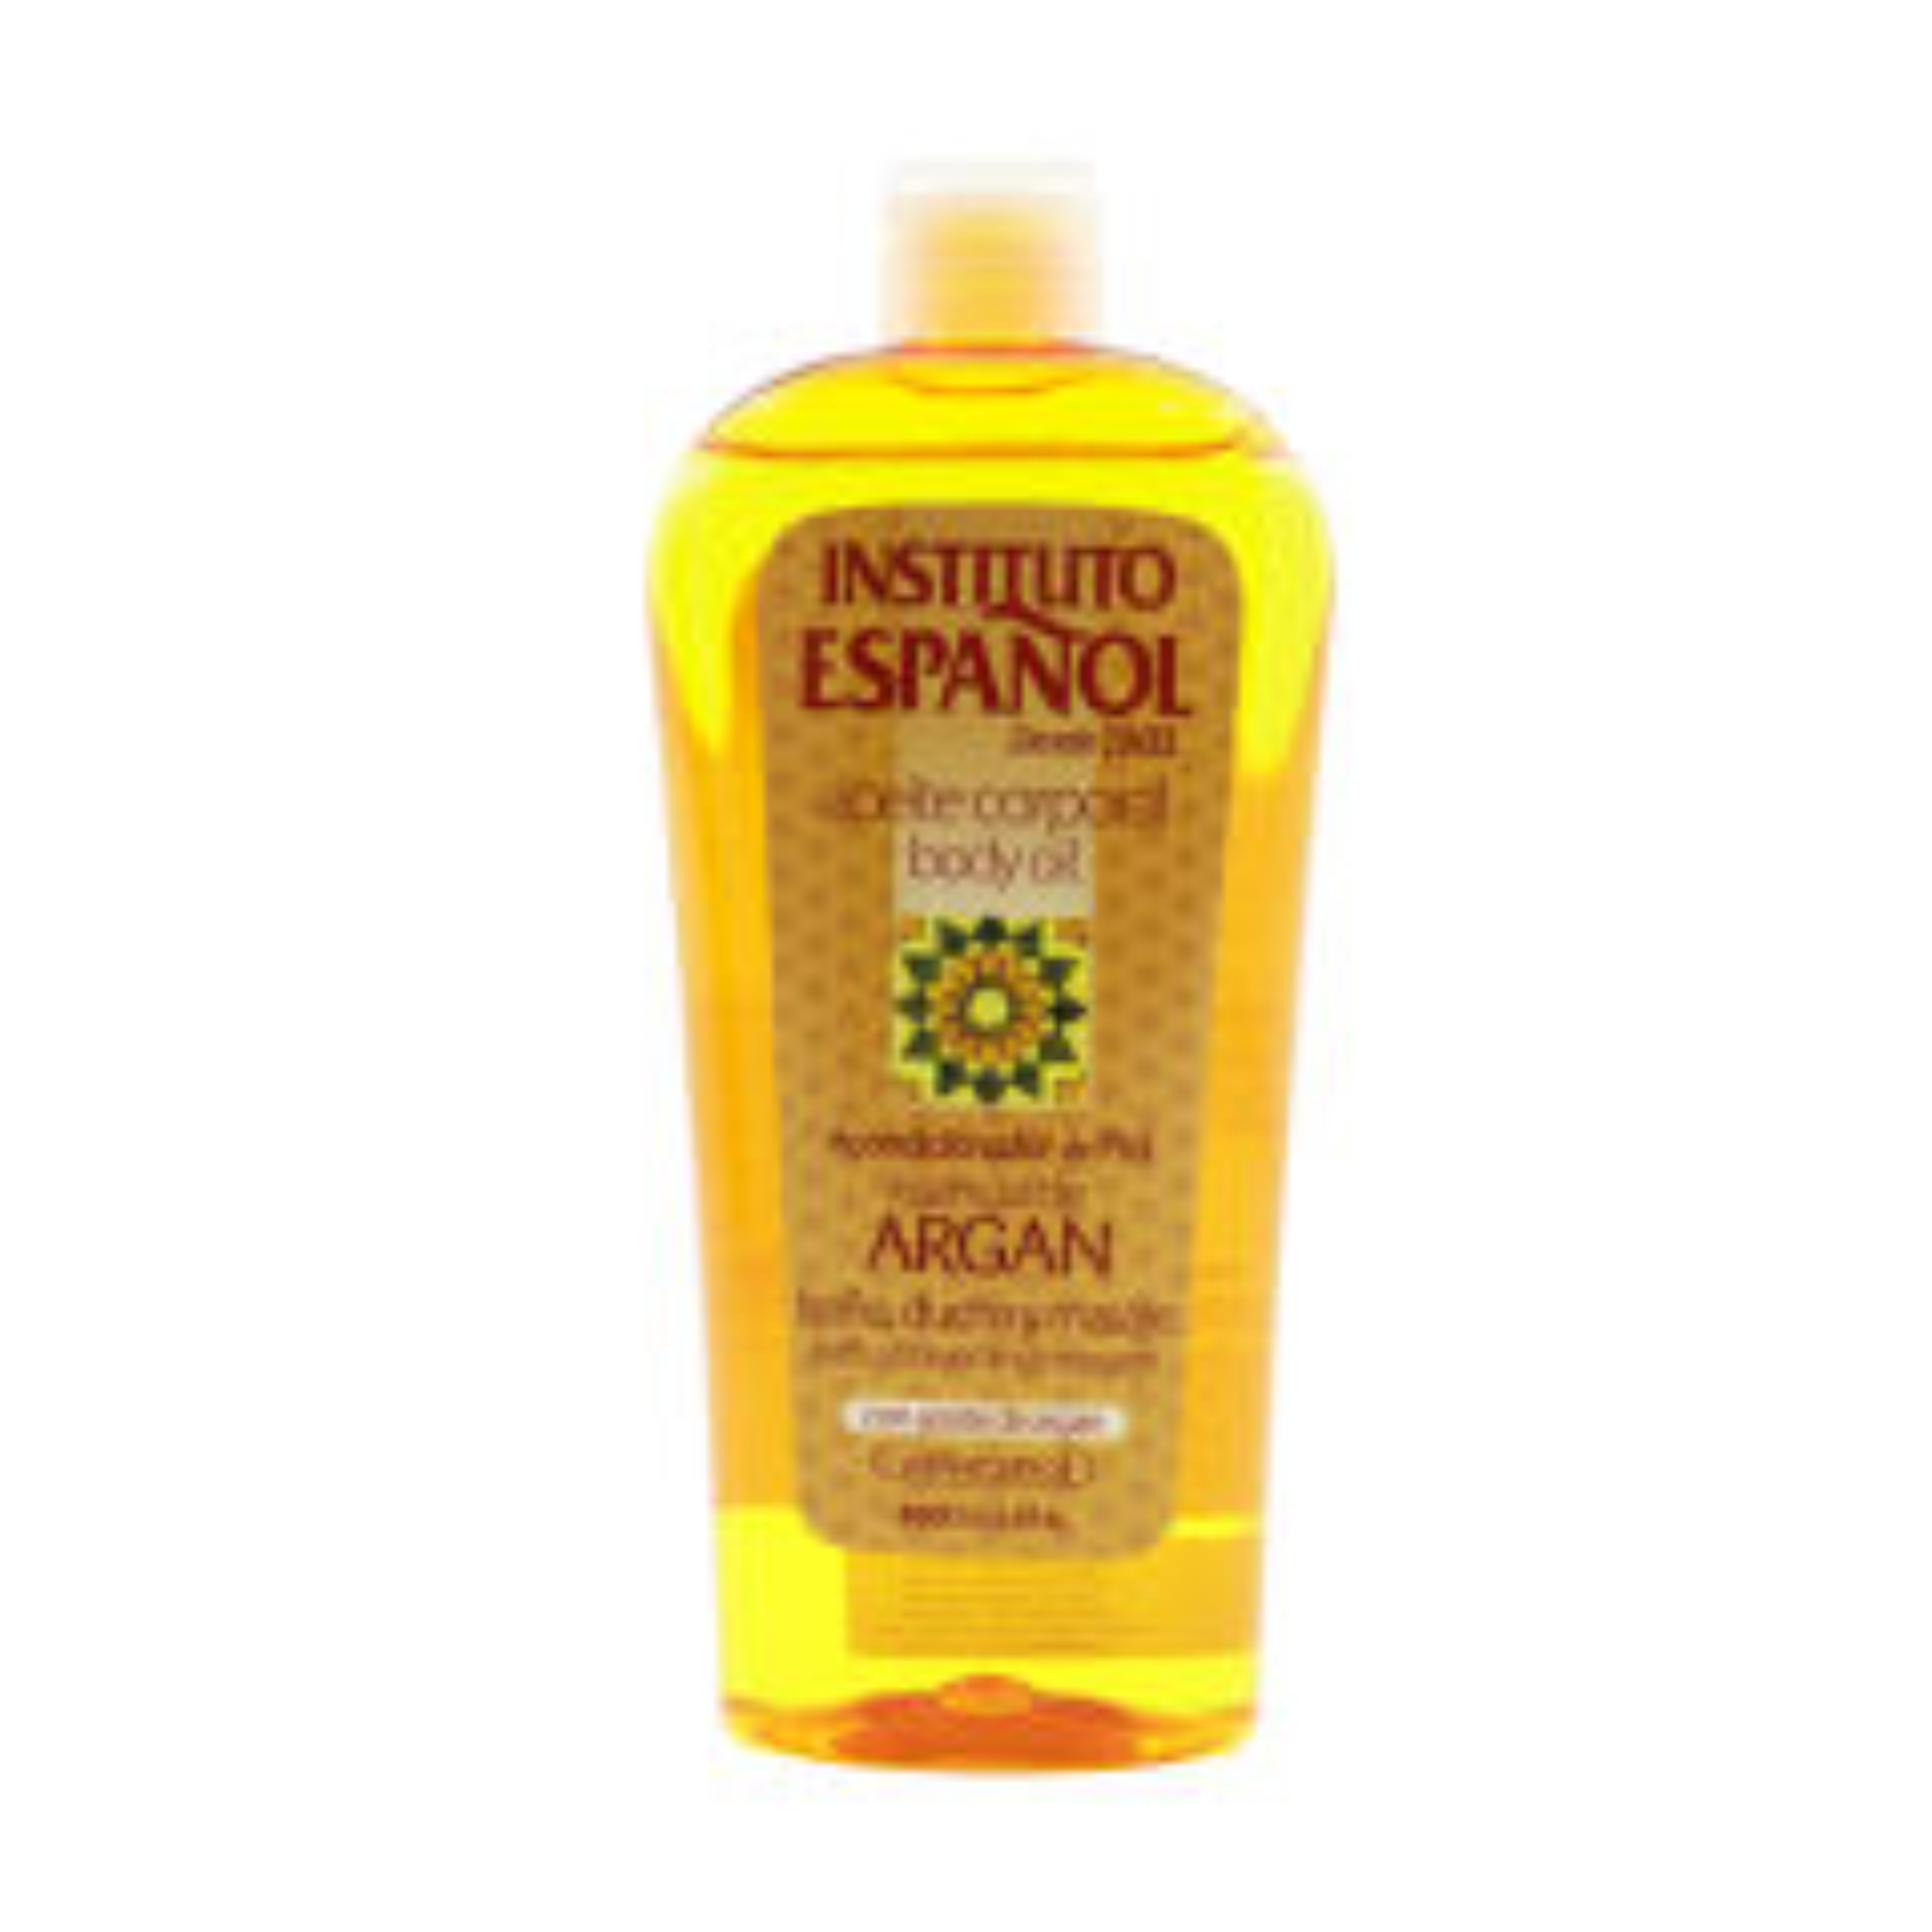 روغن بدن انستیتو اسپانول مدل argan oil حجم 400 میلی لیتر